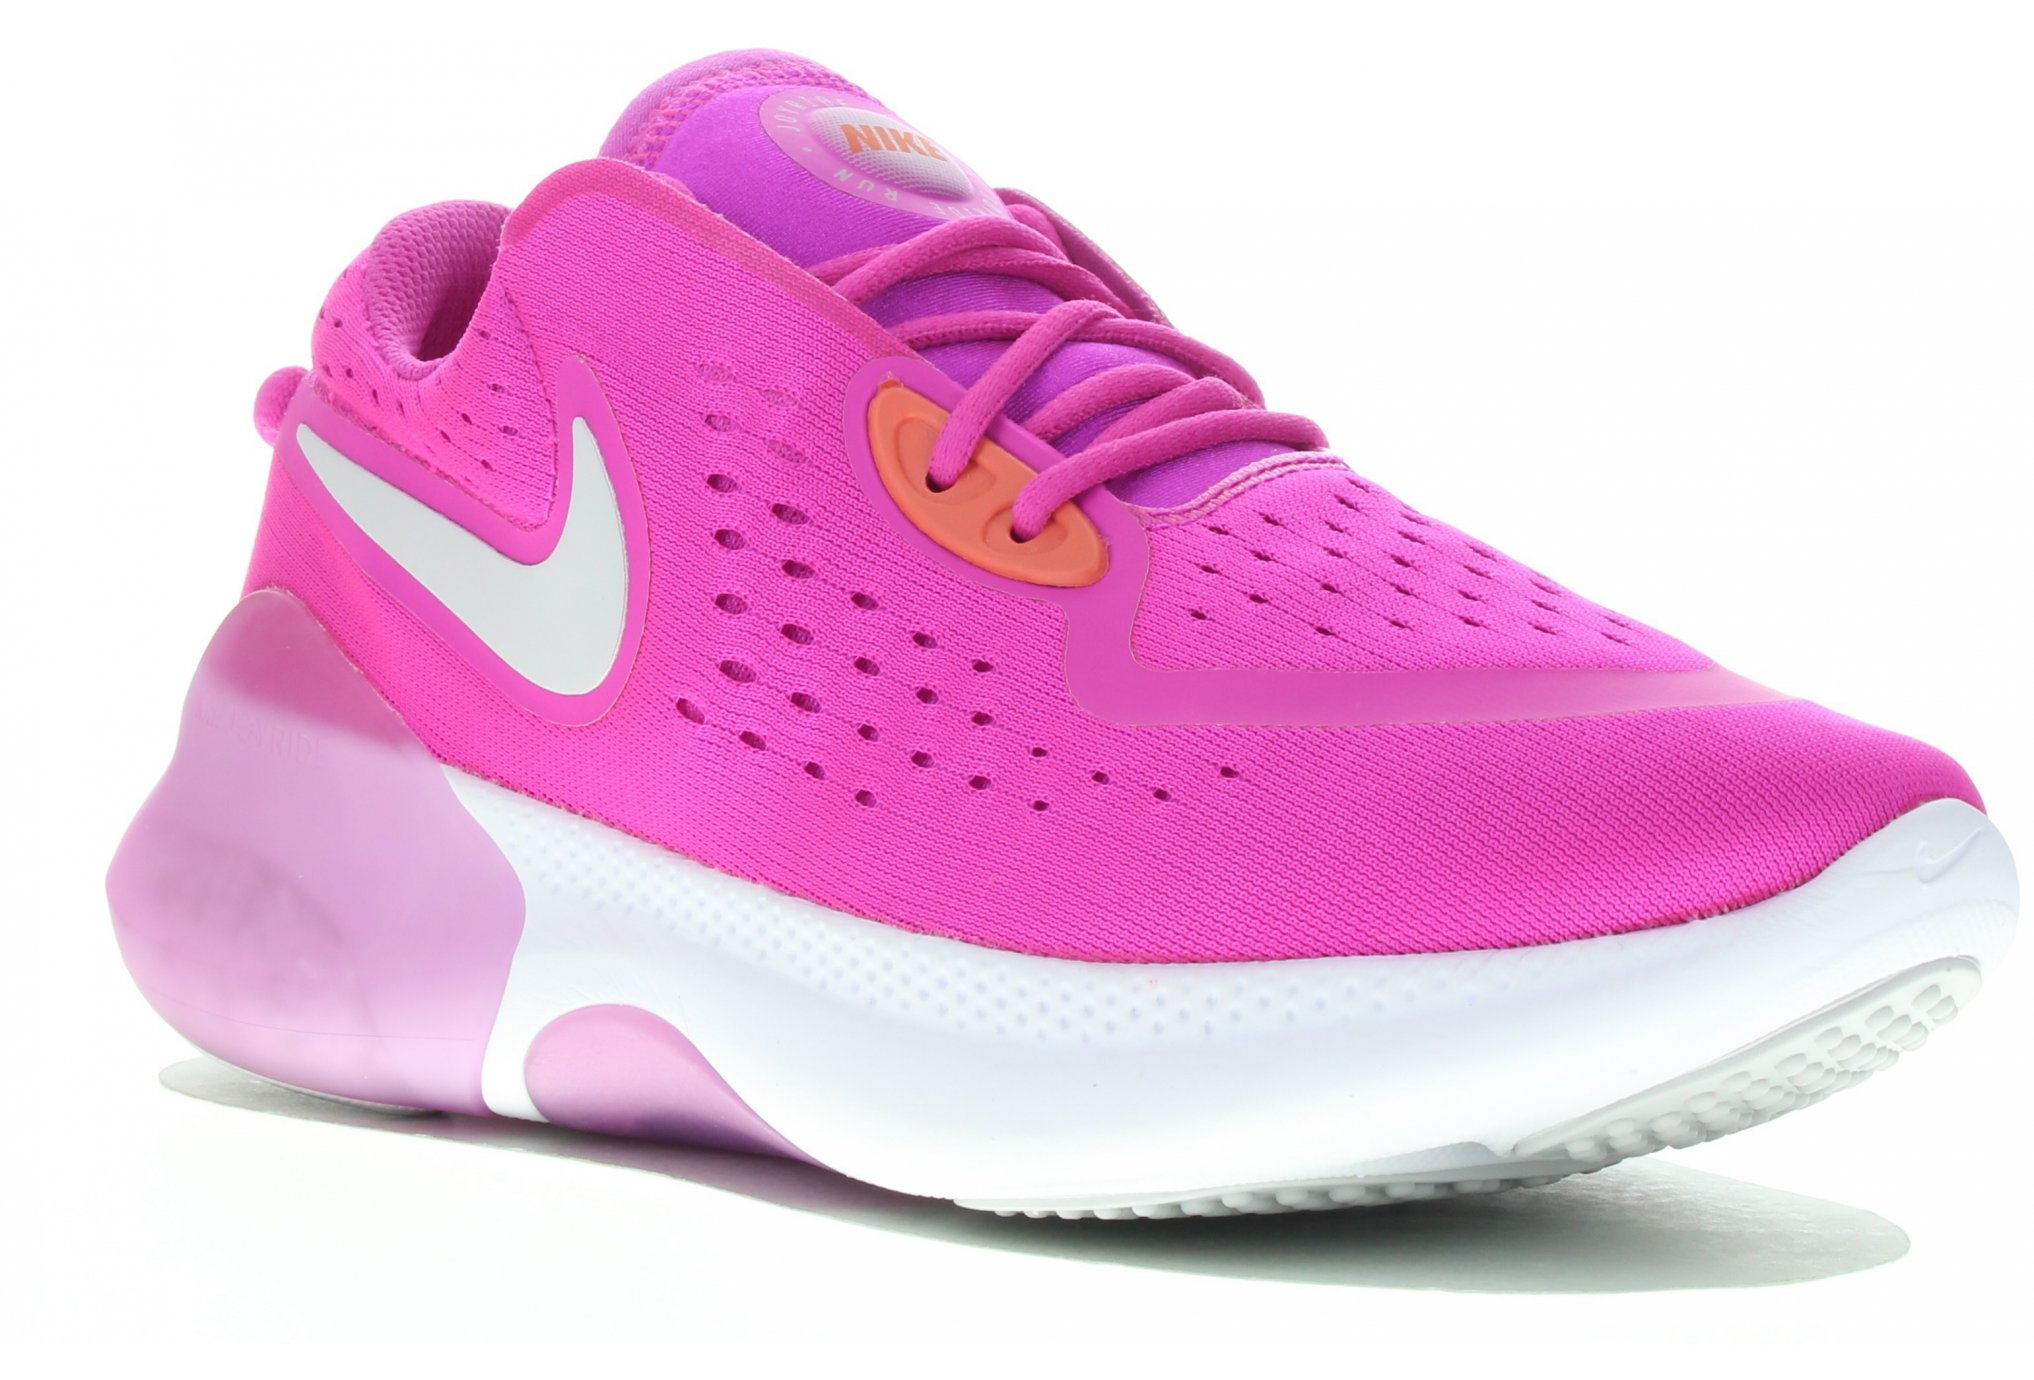 Nike Joyride Dual Run W Chaussures running femme